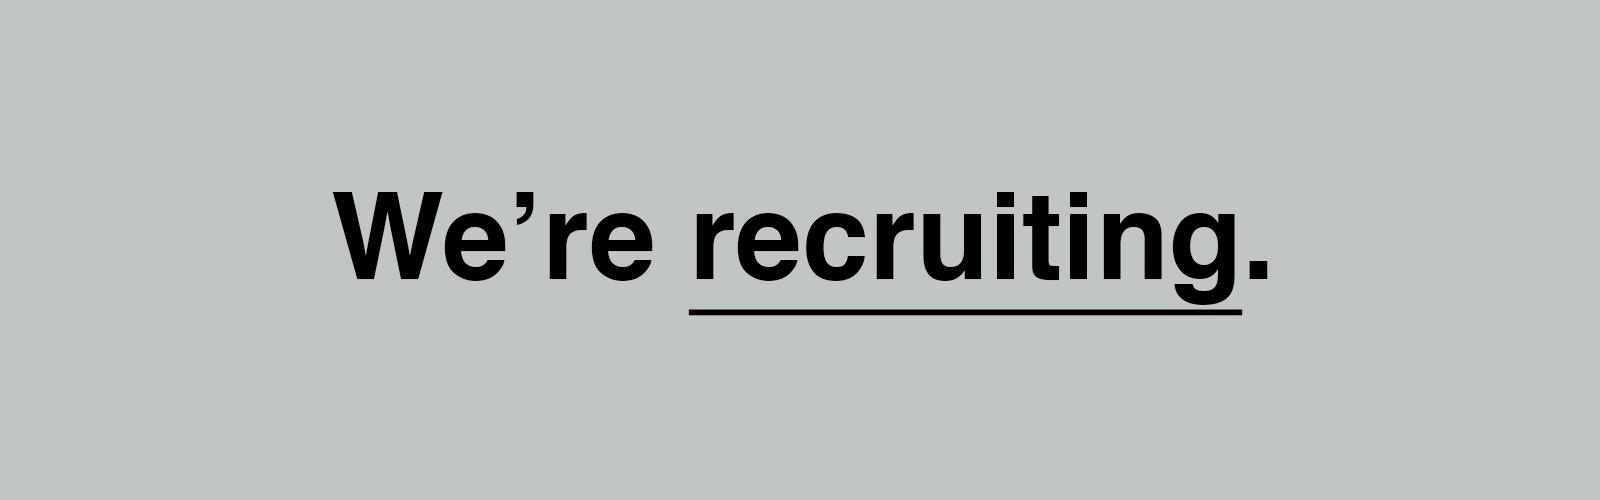 Wonderstuff are recruiting